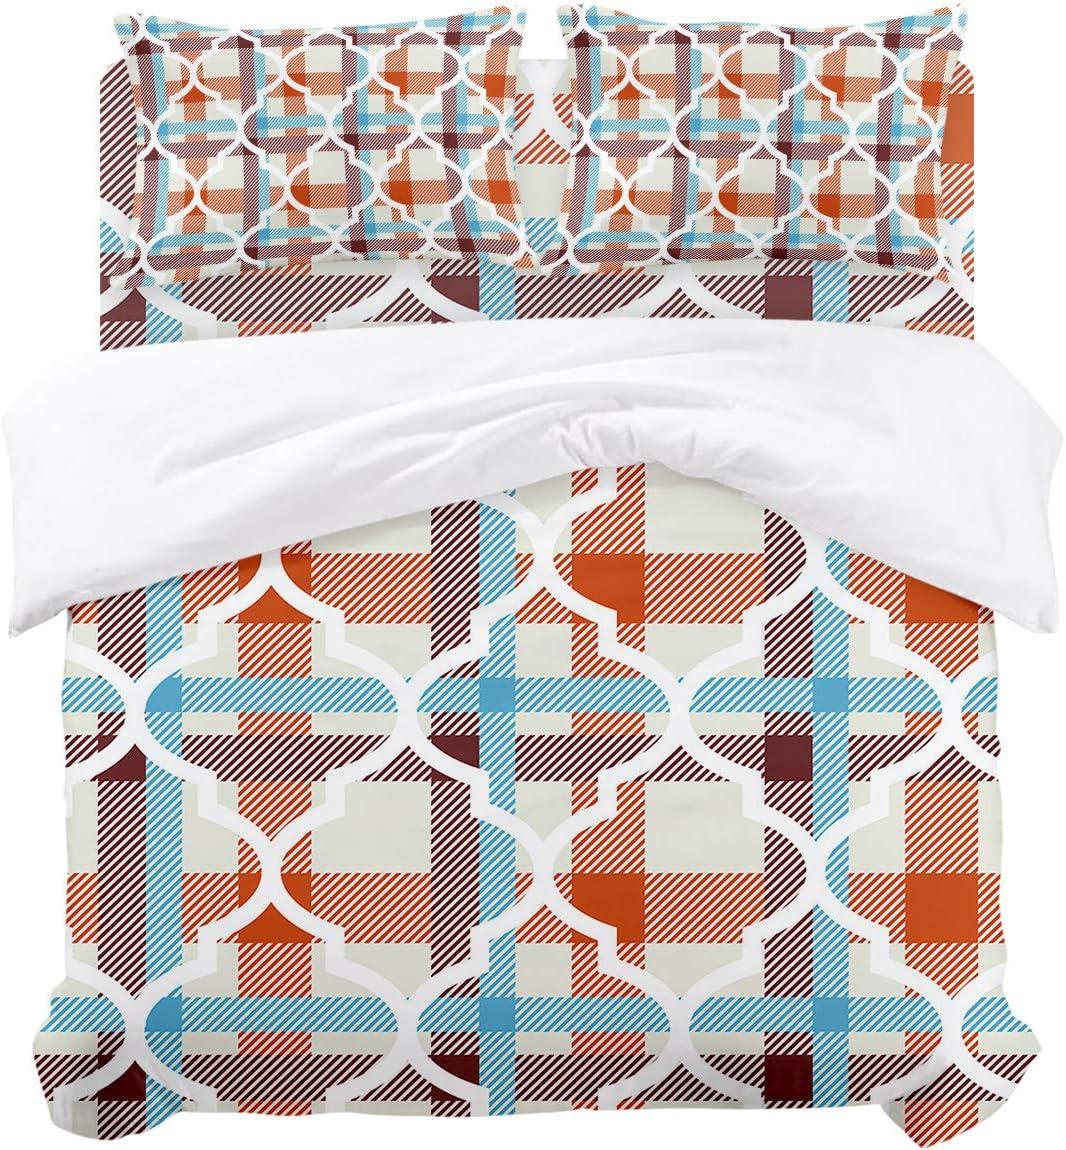 service Darlicent Full Rare Bedding Duvet Cover 4 Moroccan Trelli Piece – Set